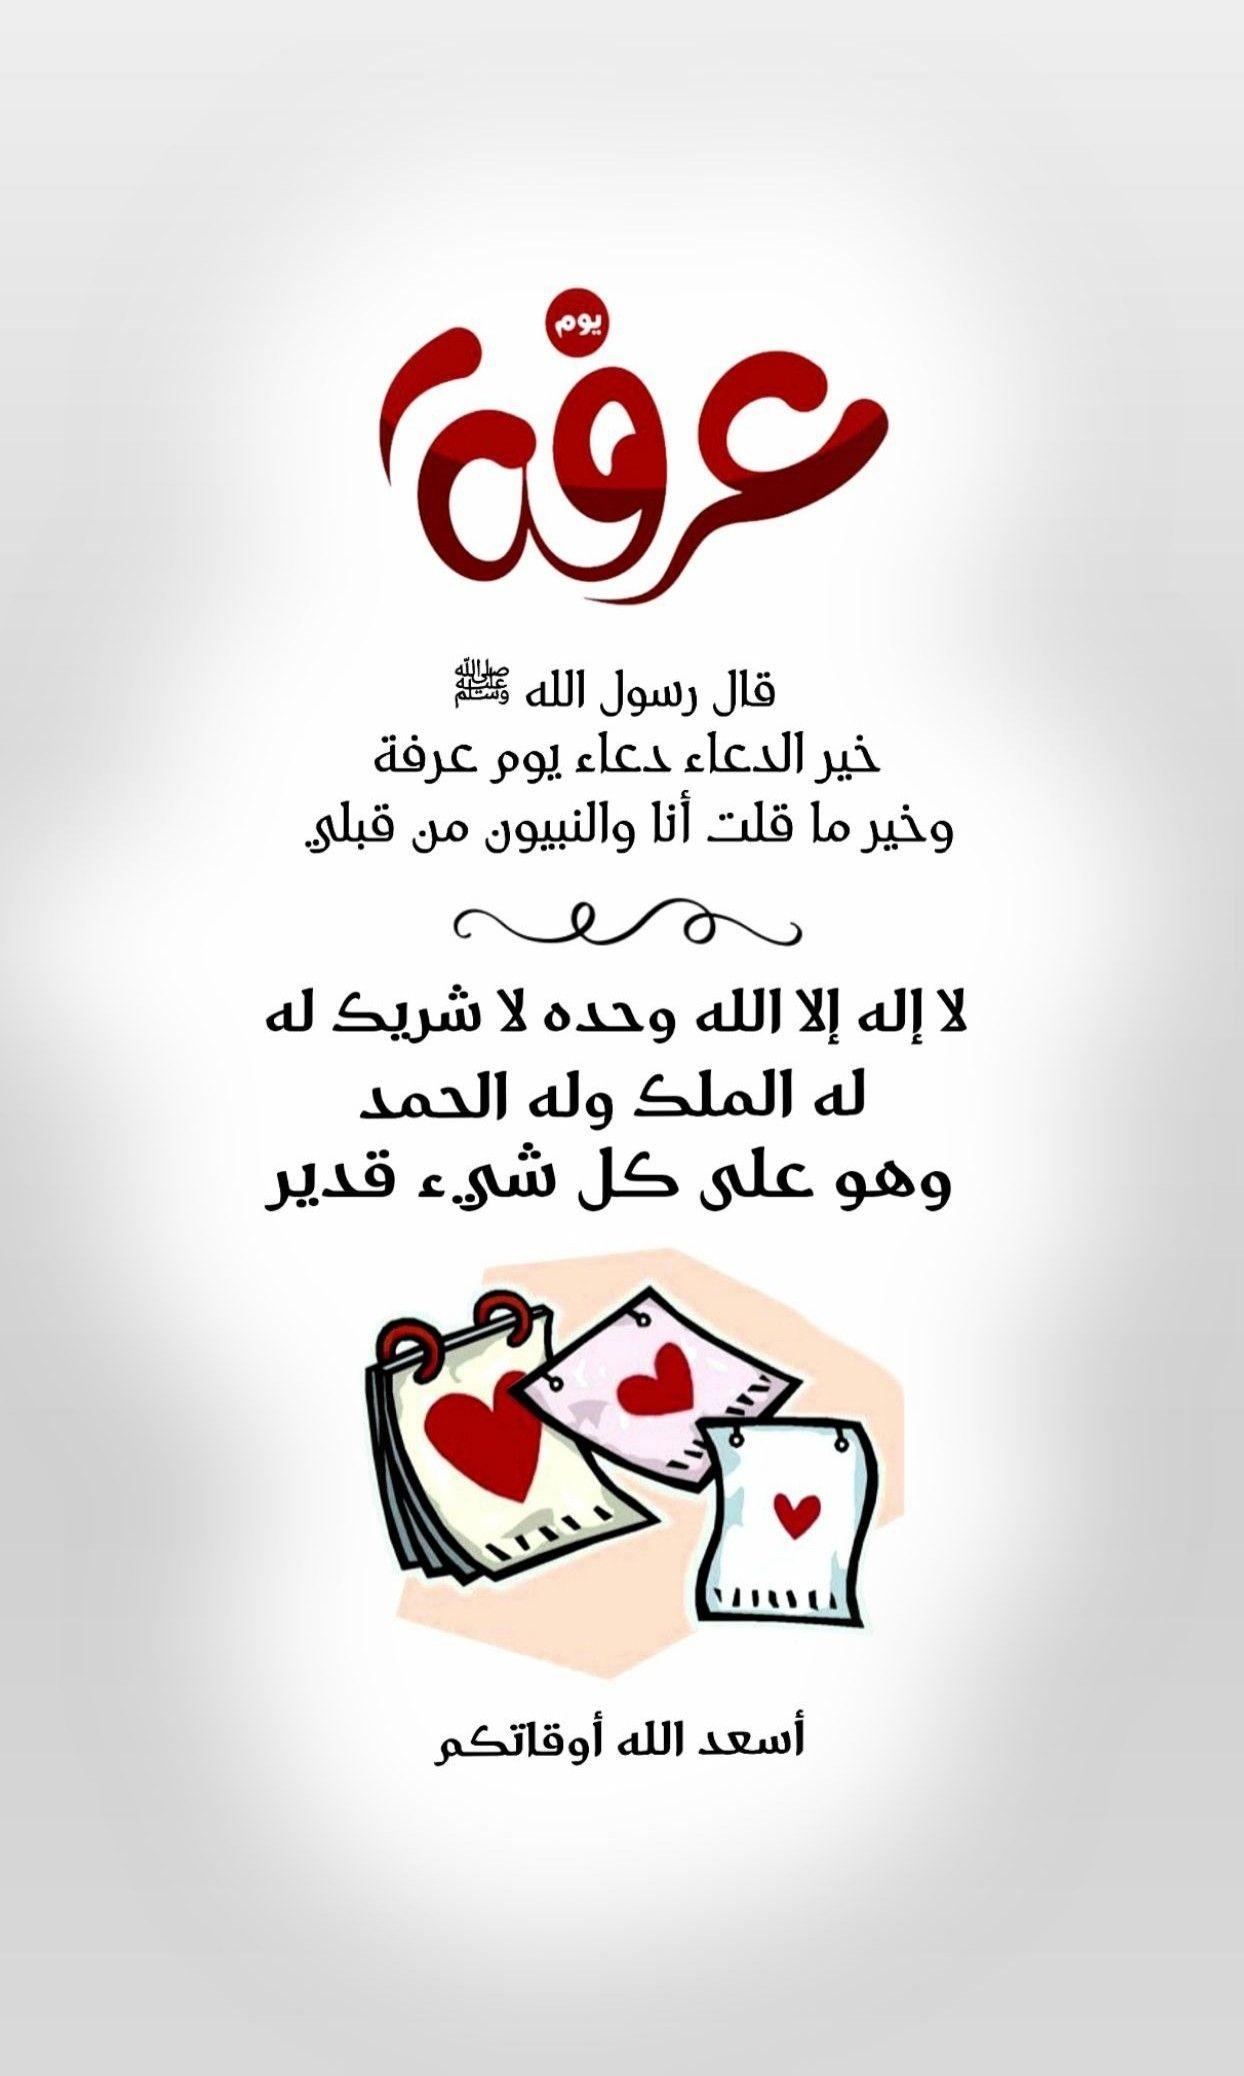 Pin By Rolan Amin On يوم عرفة Quran Quotes Love Good Morning Greetings Quran Quotes